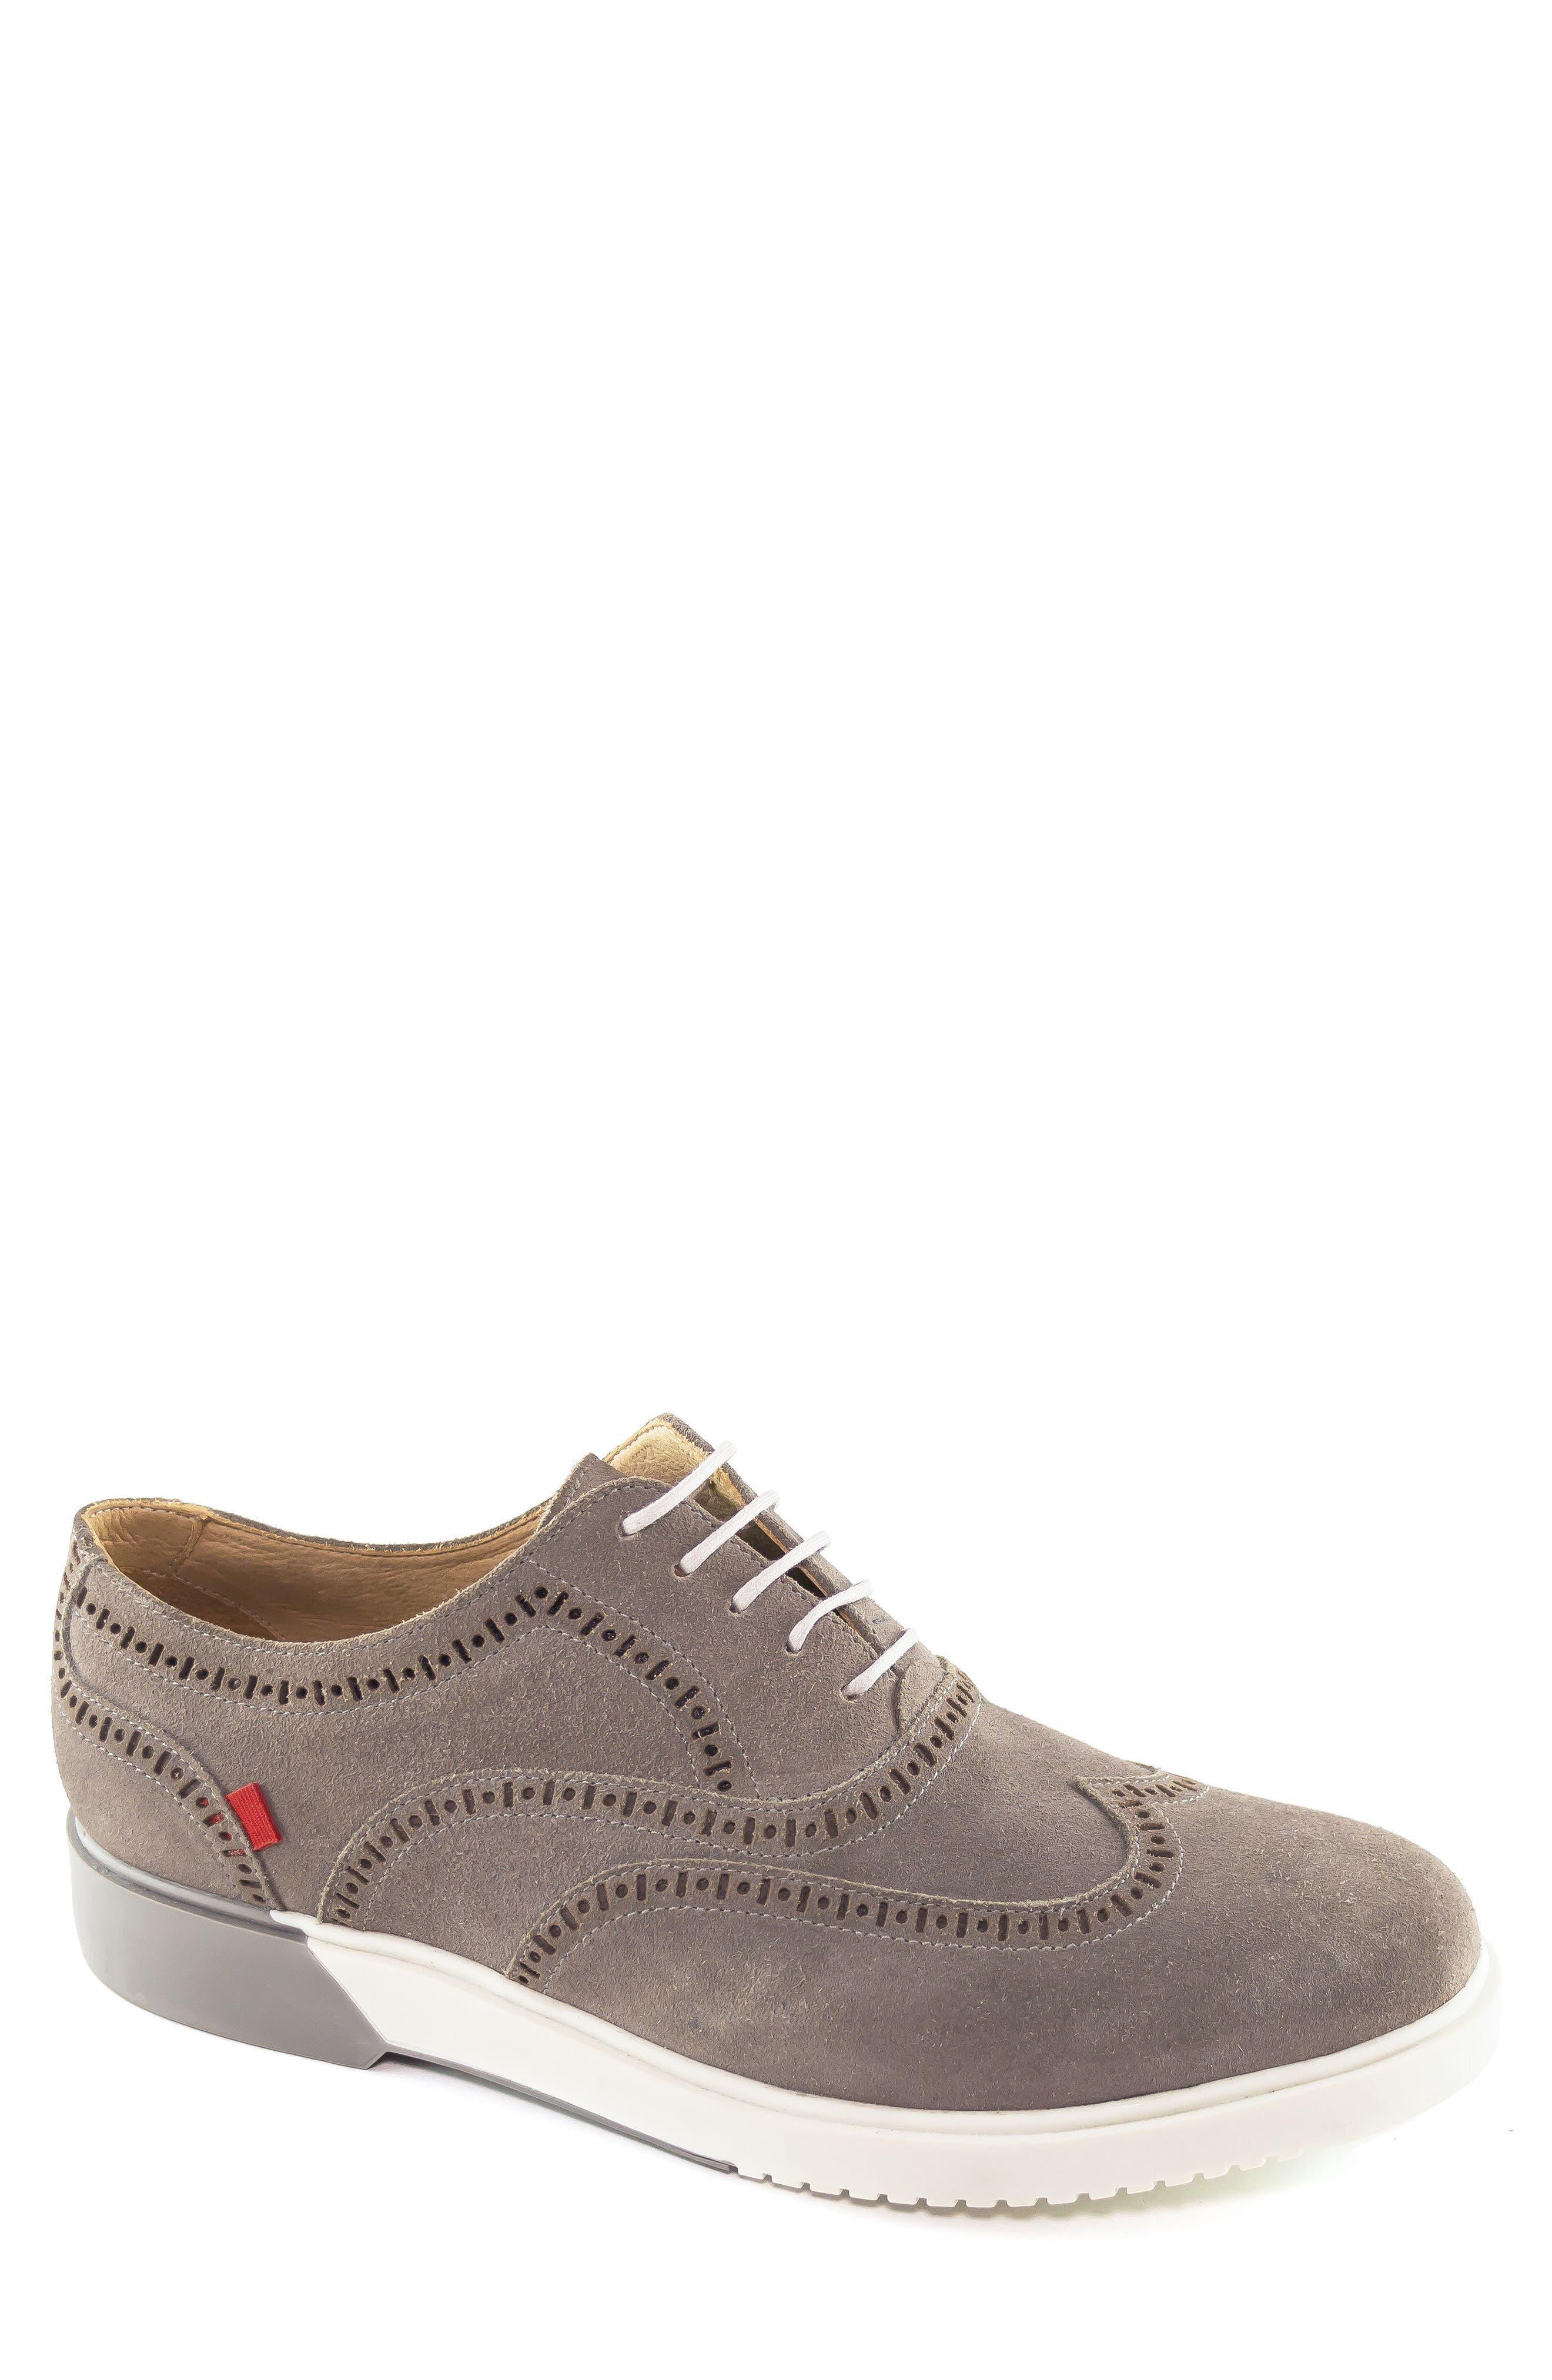 5th Ave Wingtip Sneaker,                         Main,                         color, GREY SUEDE